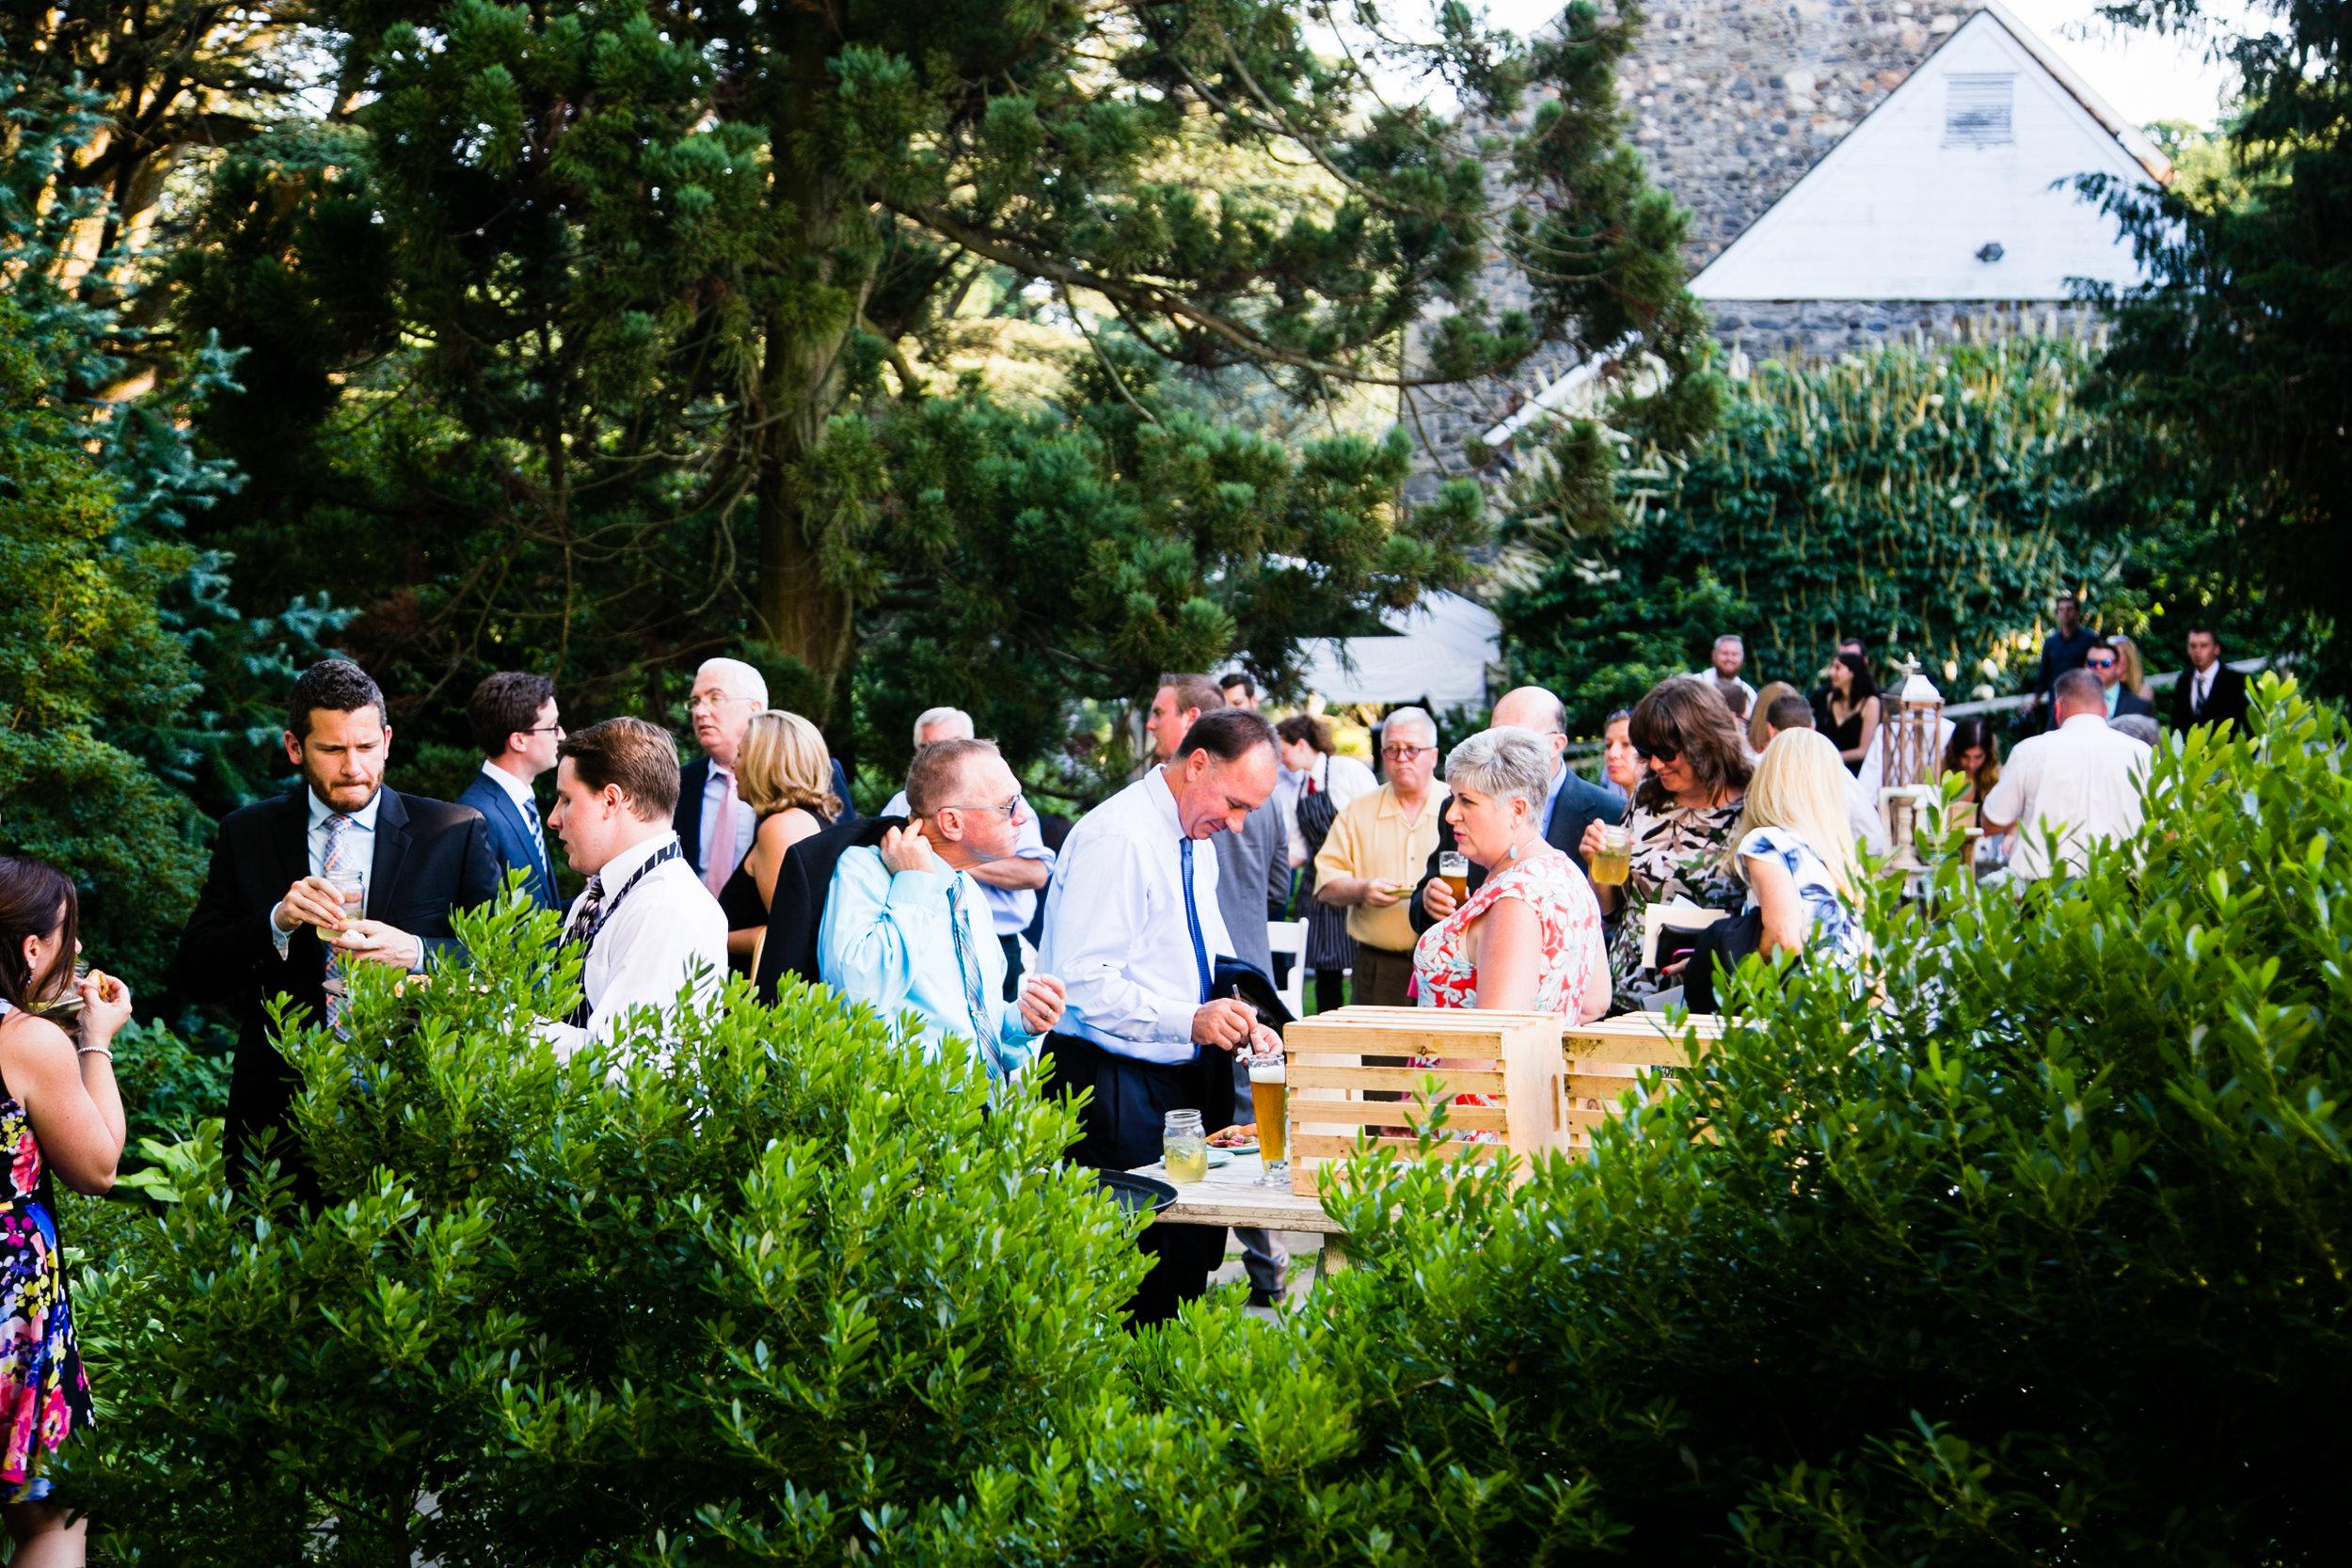 TYLER ARBORETUM WEDDING PHOTOGRAPHY LOVESTRUCK PICTURES-064.jpg